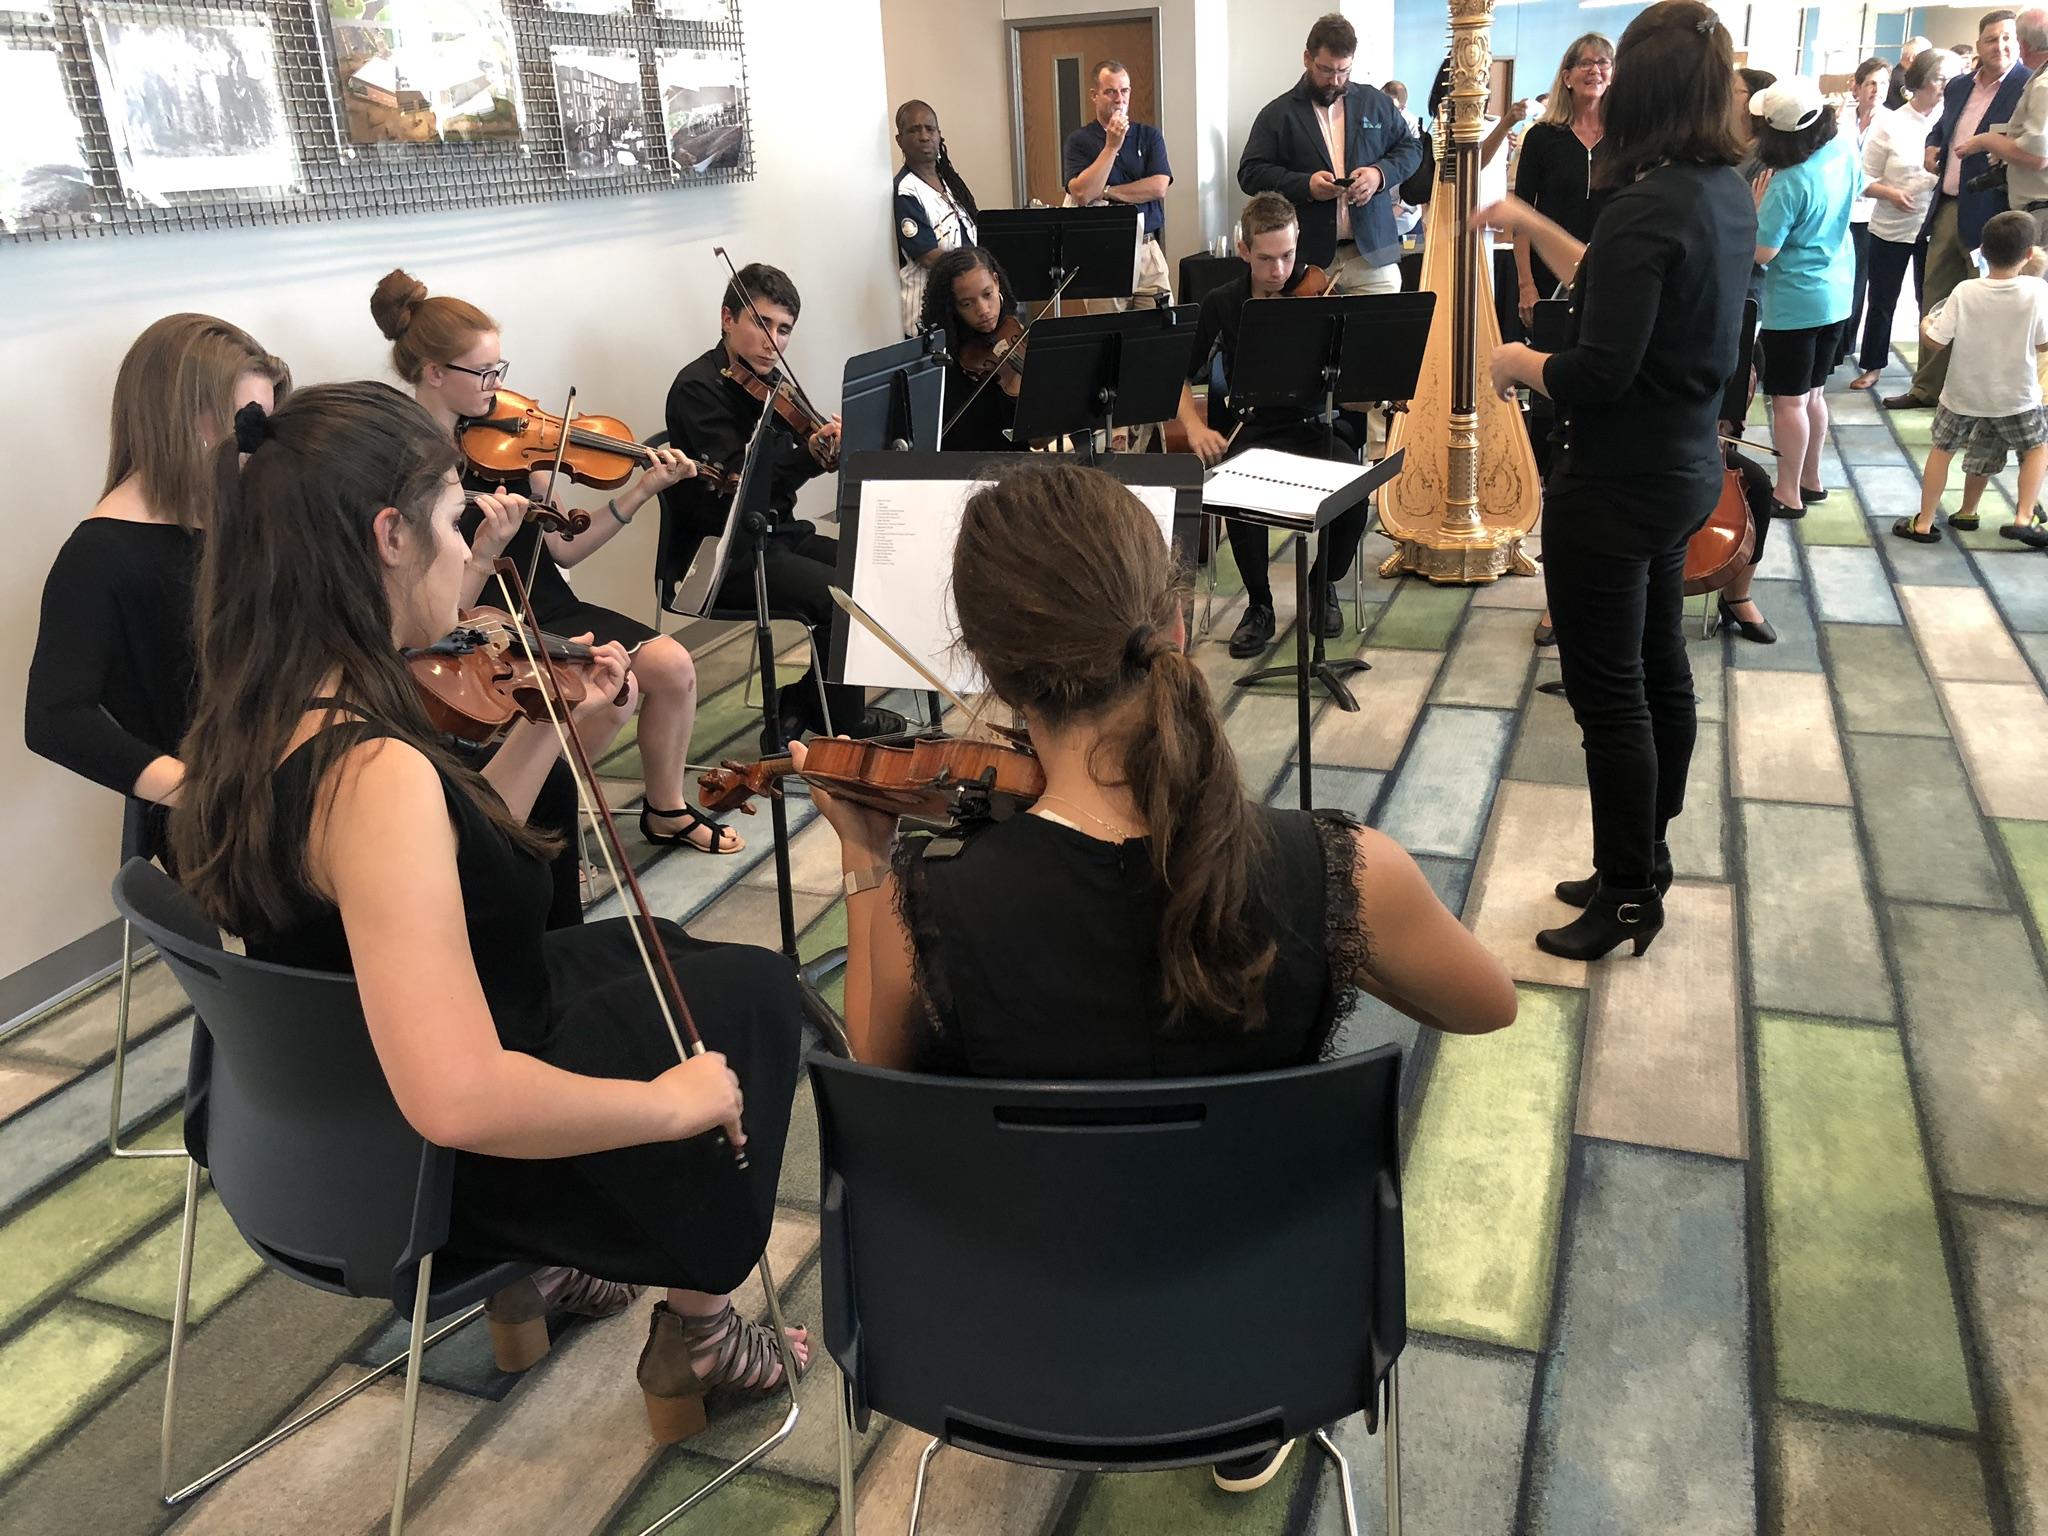 High school students serenade